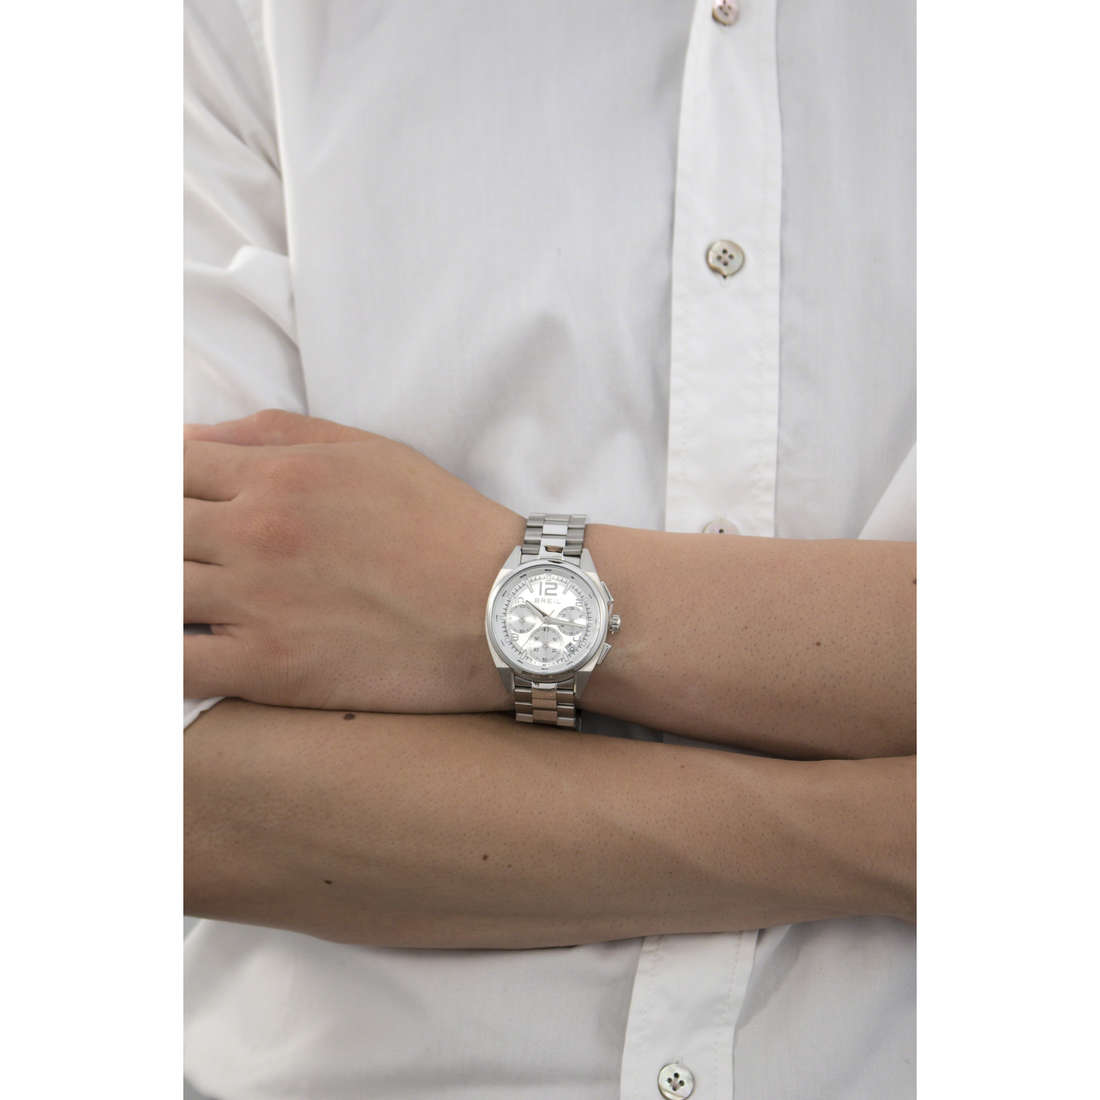 Breil cronografi Master uomo TW1410 indosso